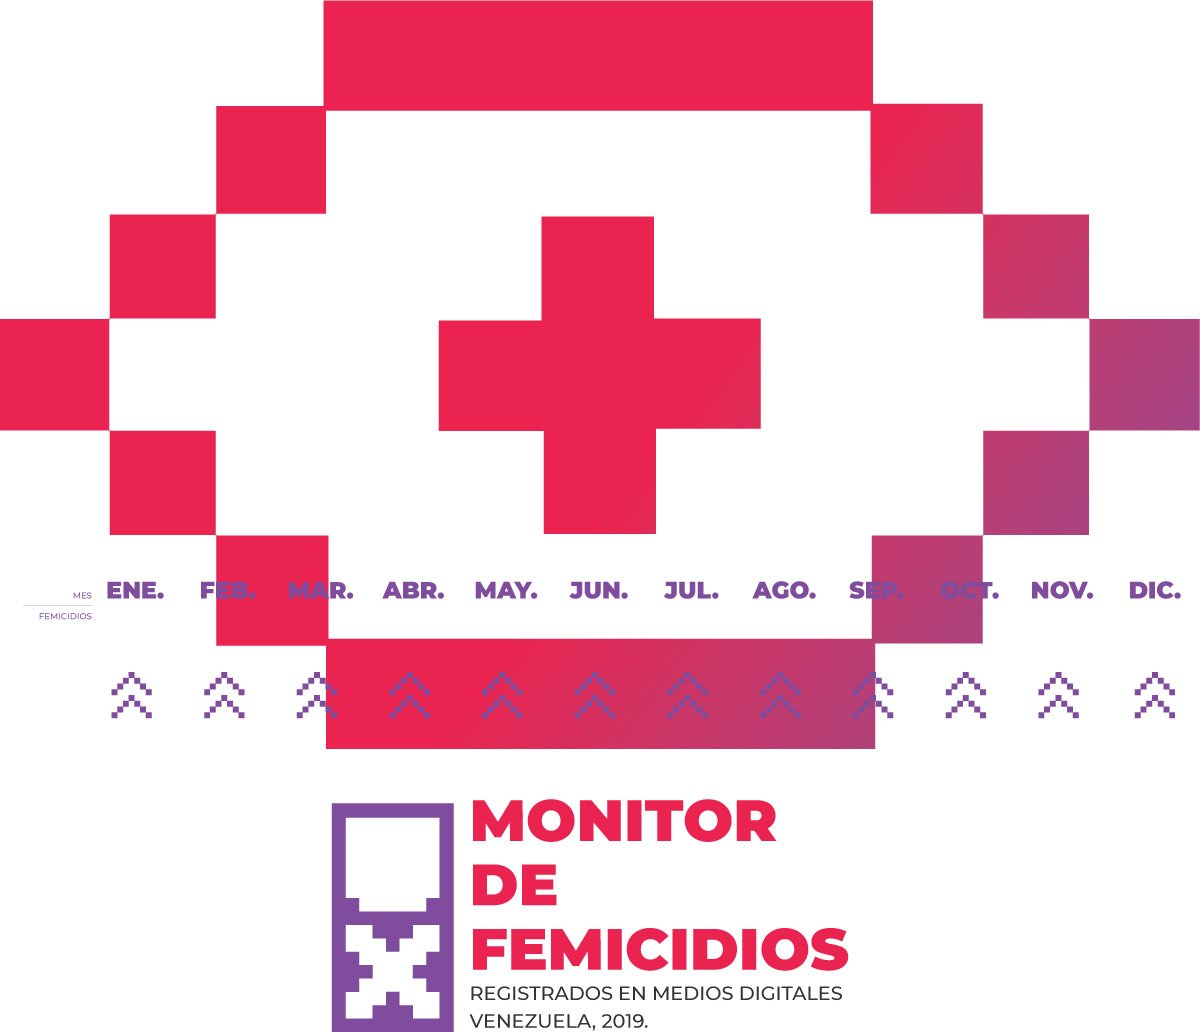 Monitor de Femicidios 2019